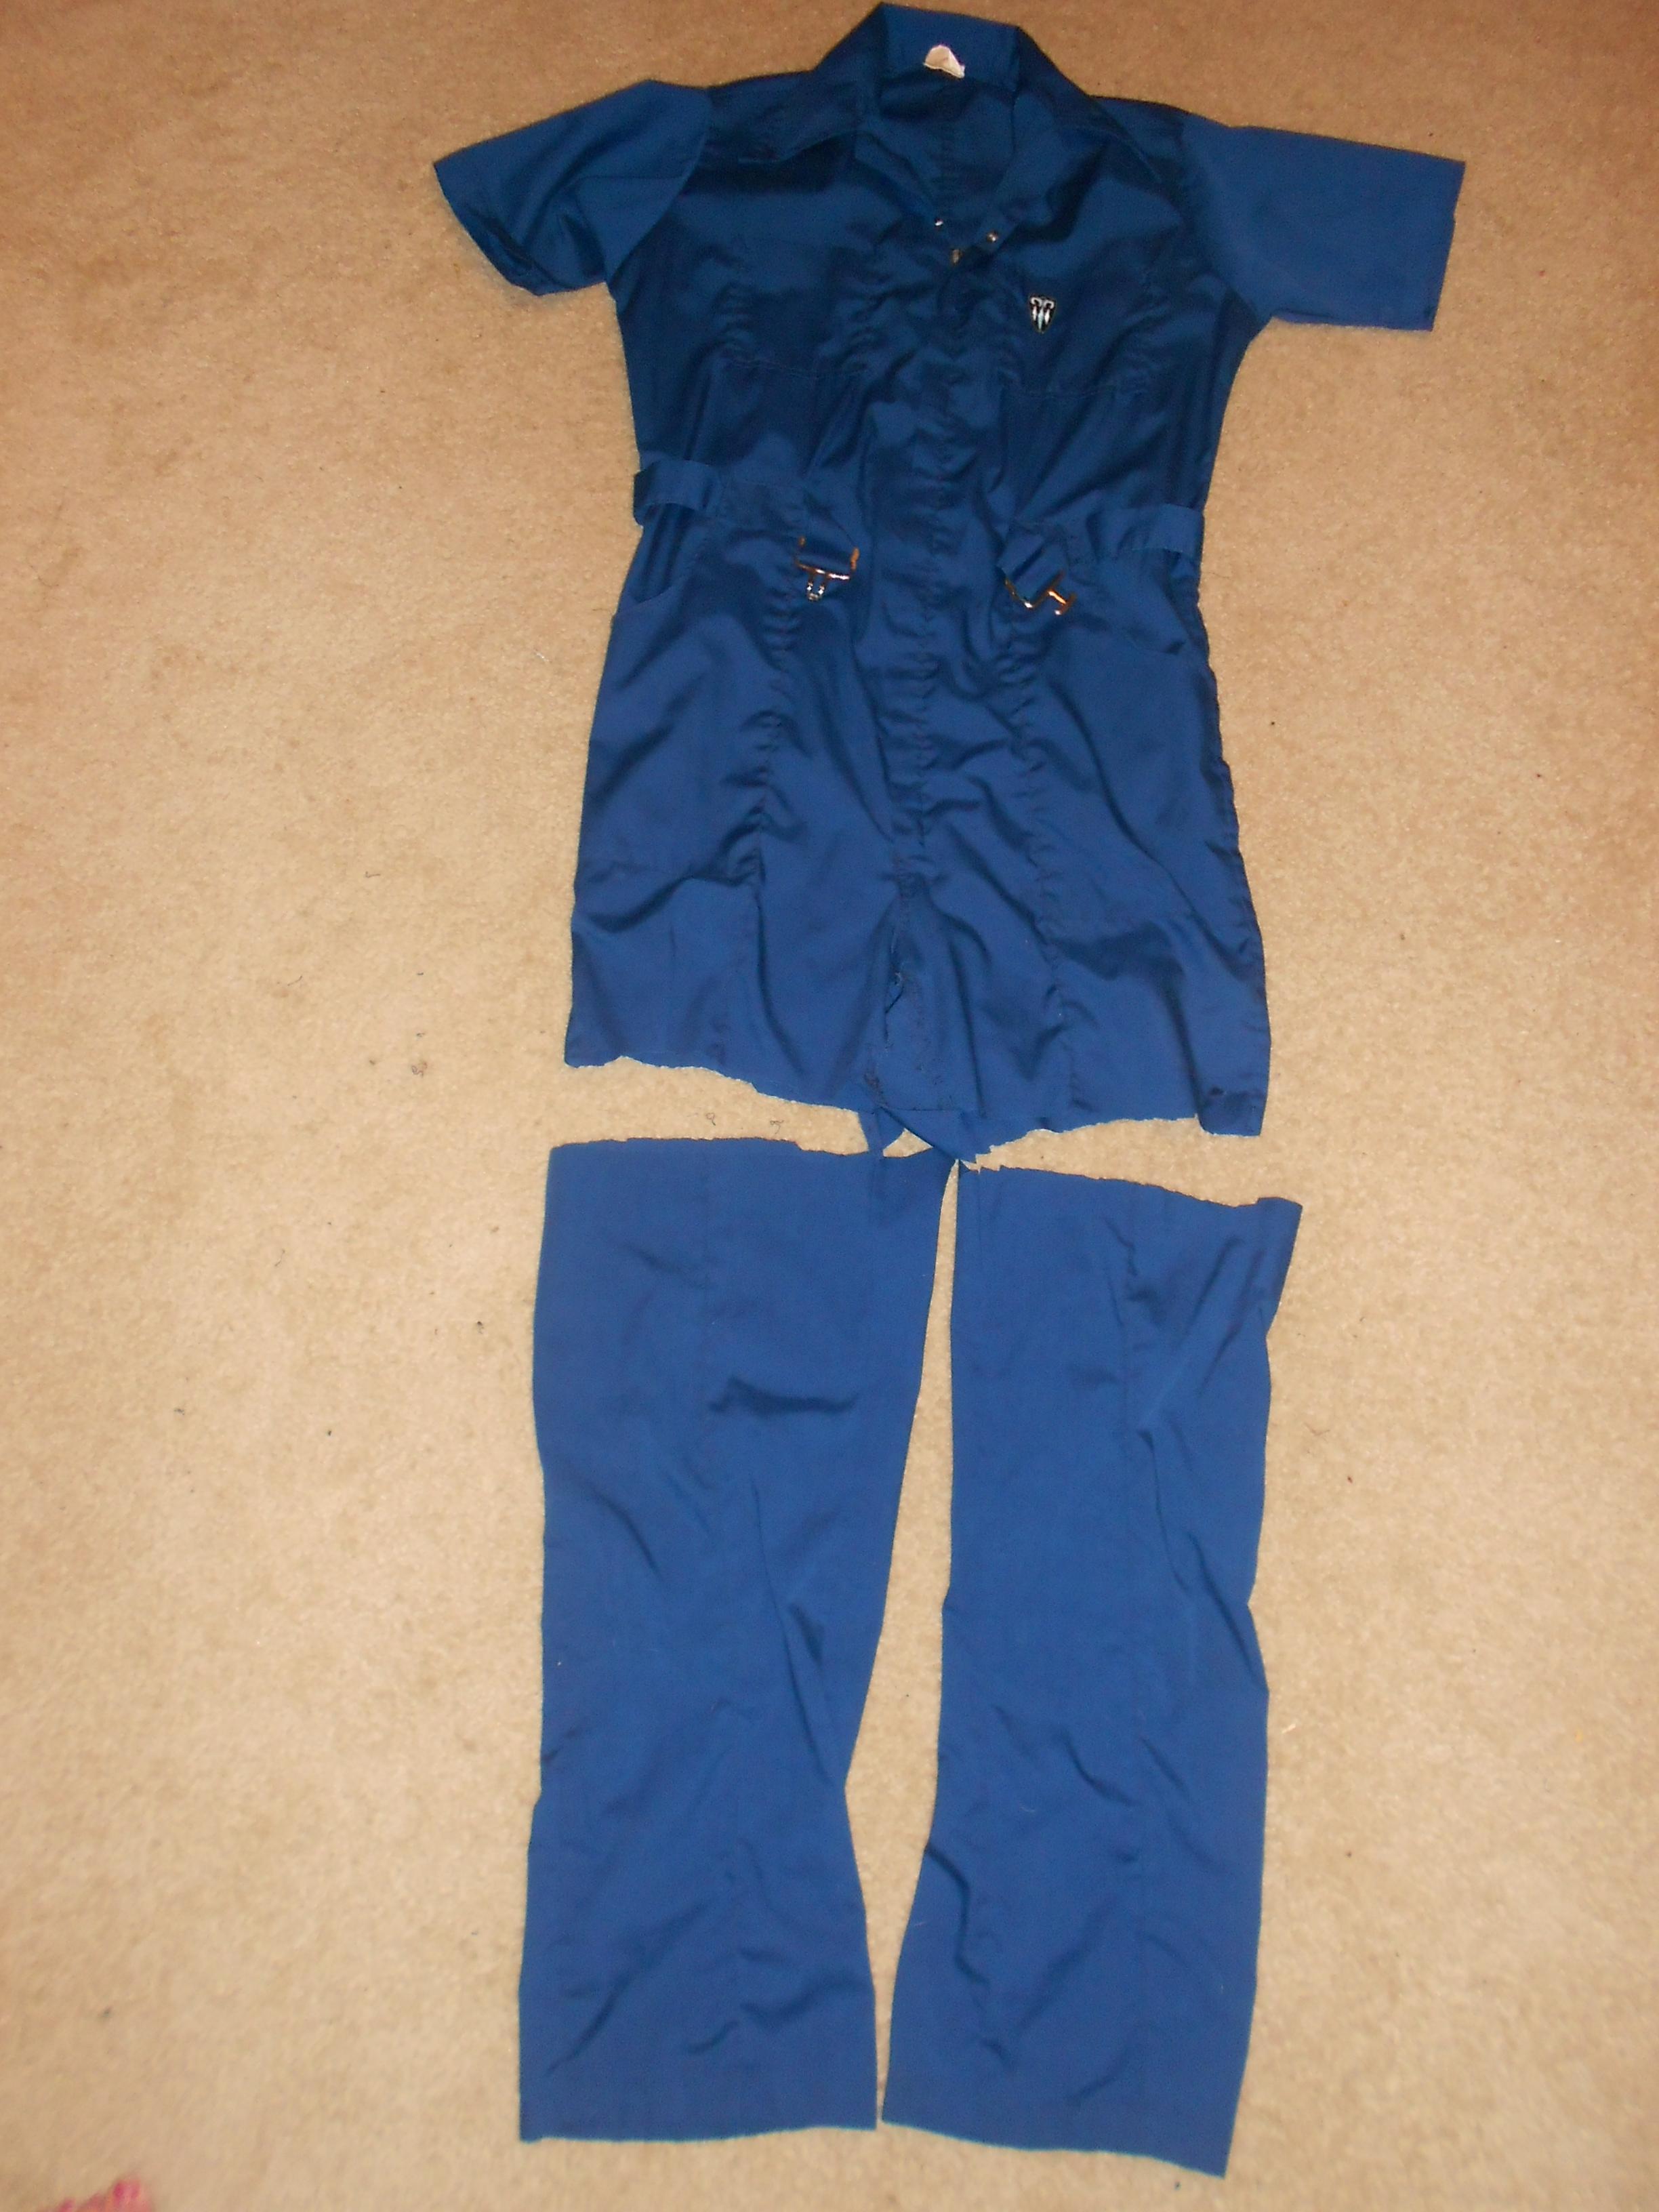 Day 279:  Uptown Girl Dress 5